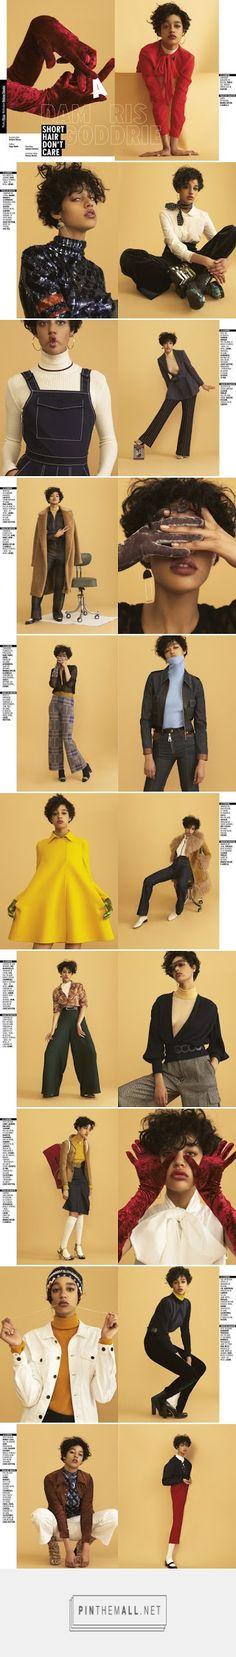 Jalouse September 2015 - created on Fashion Poses, Fashion Shoot, Editorial Fashion, Fashion Photography Inspiration, Editorial Photography, Style Inspiration, Damaris Goddrie, High Fashion, Fashion Beauty